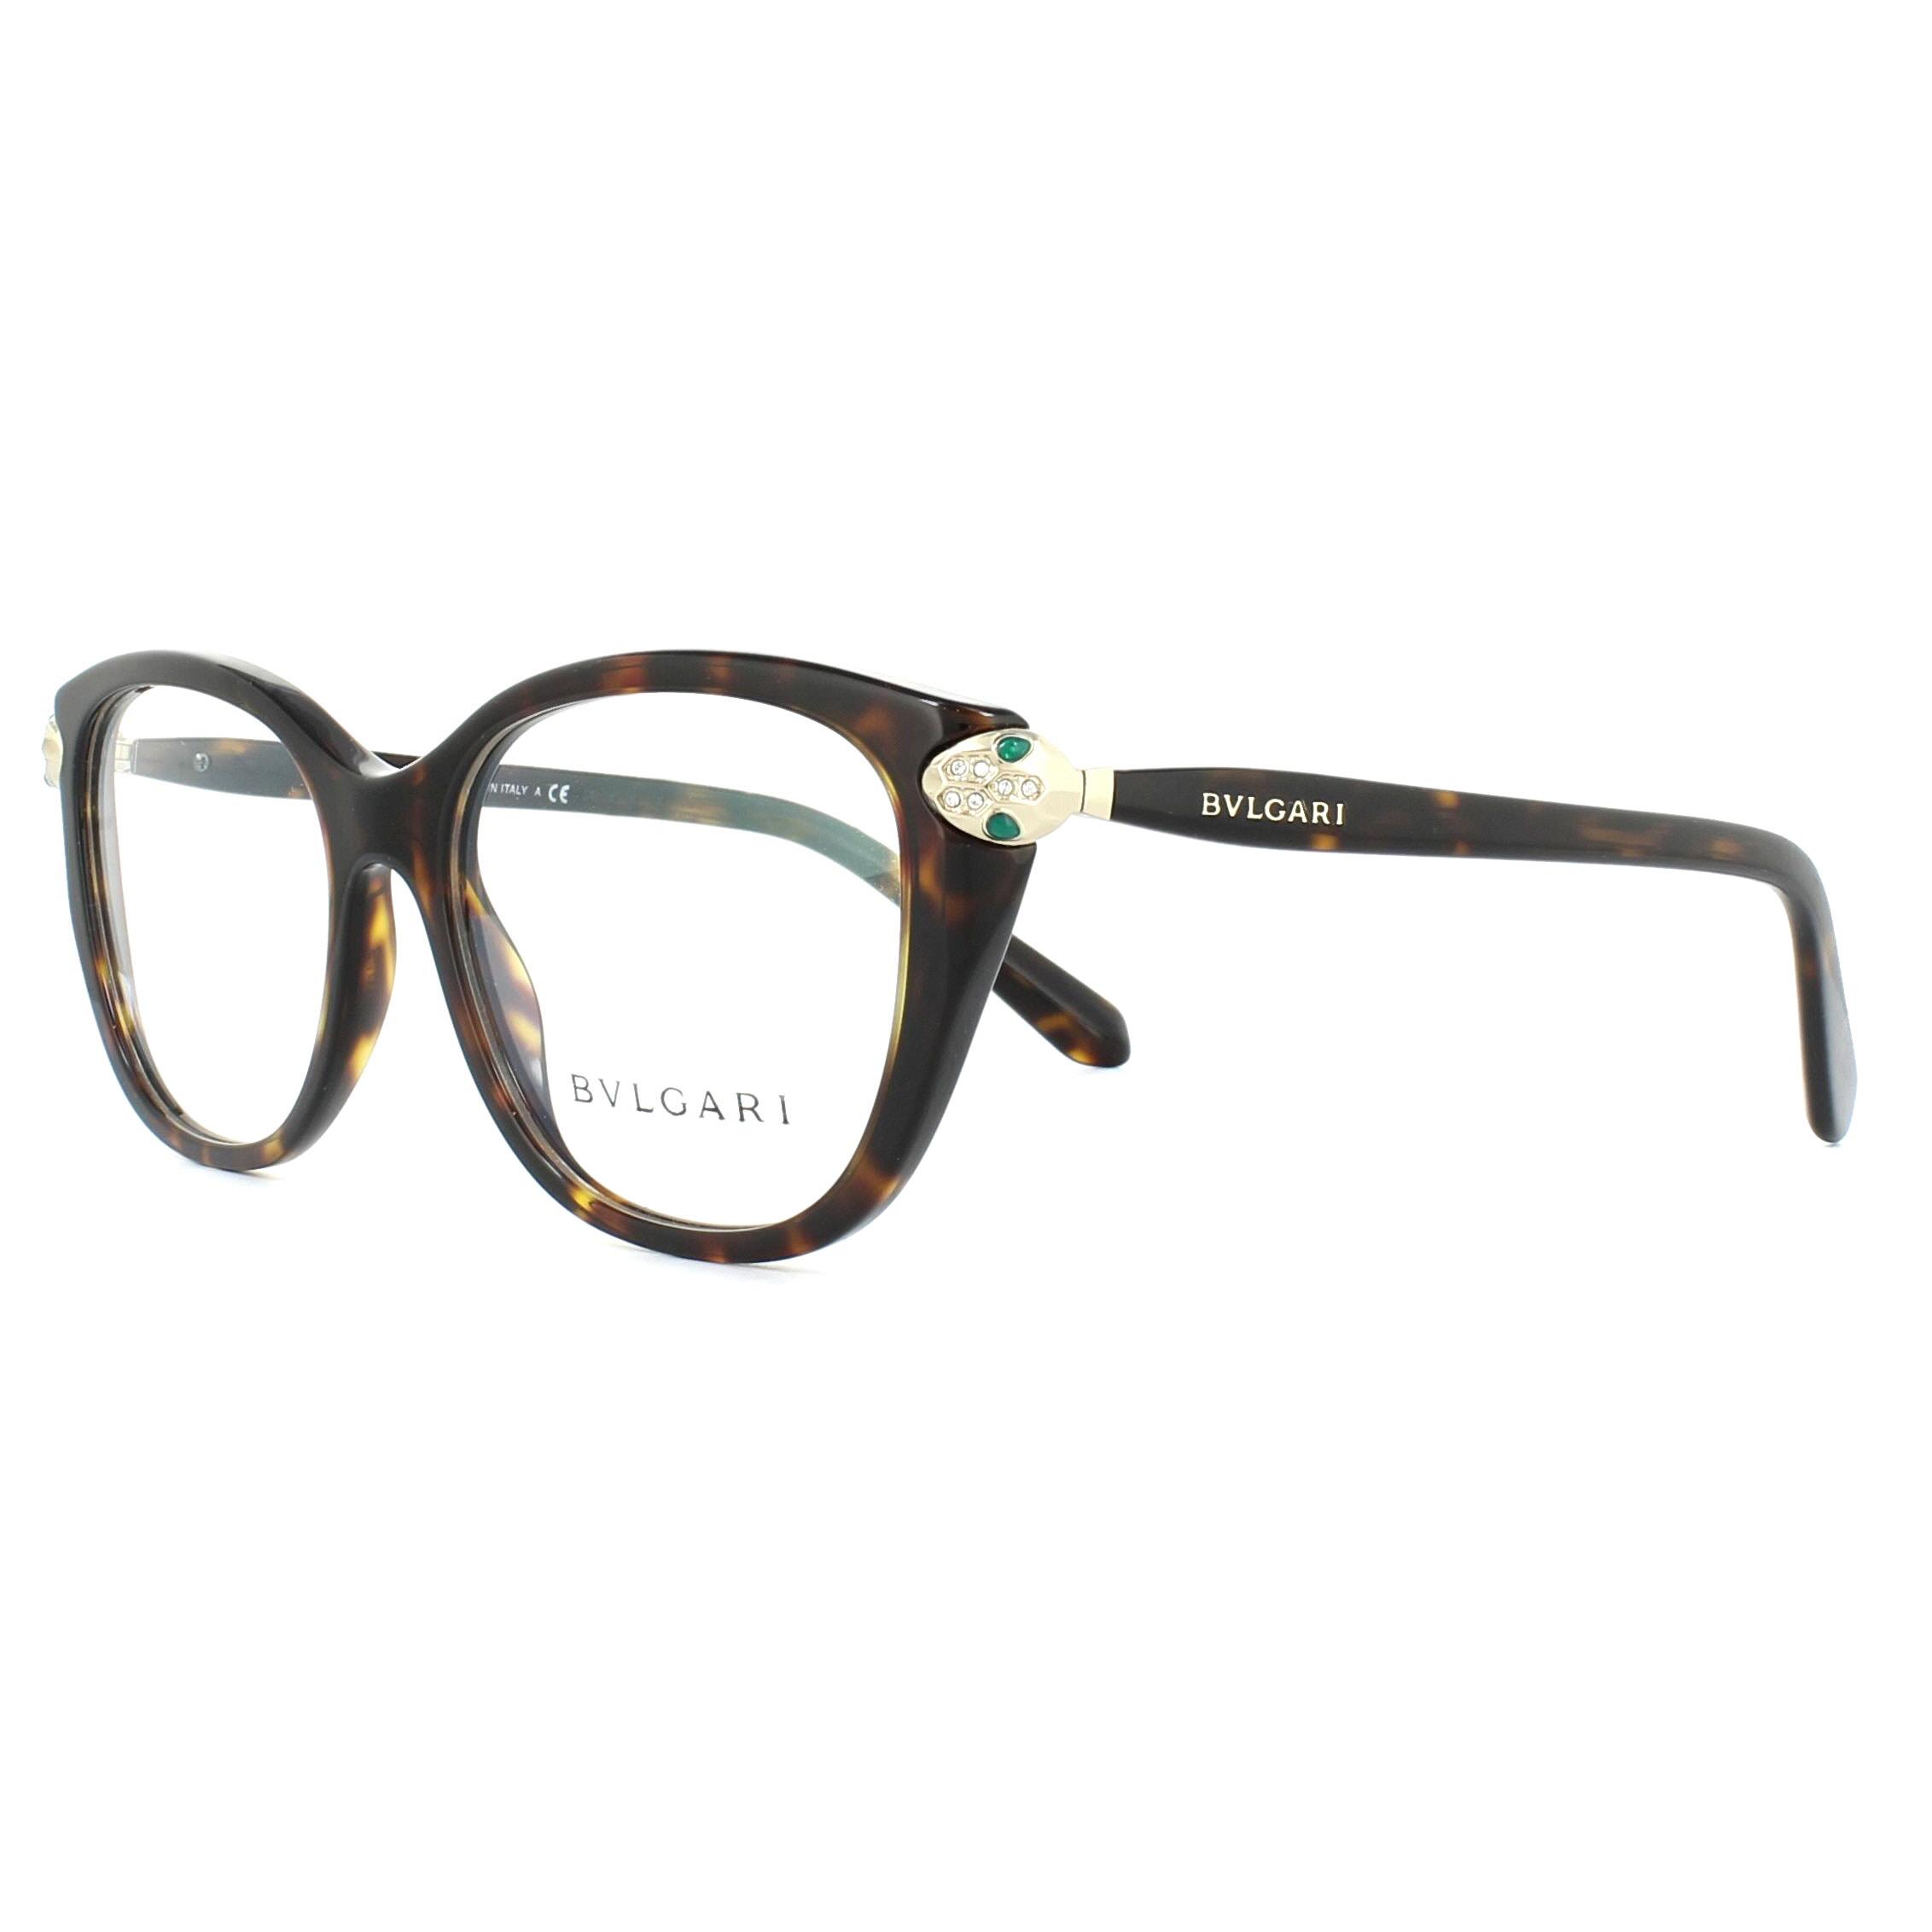 ecba3ee35f7c Sentinel Bvlgari Glasses Frames 4140B 504 Dark Havana 54mm Womens